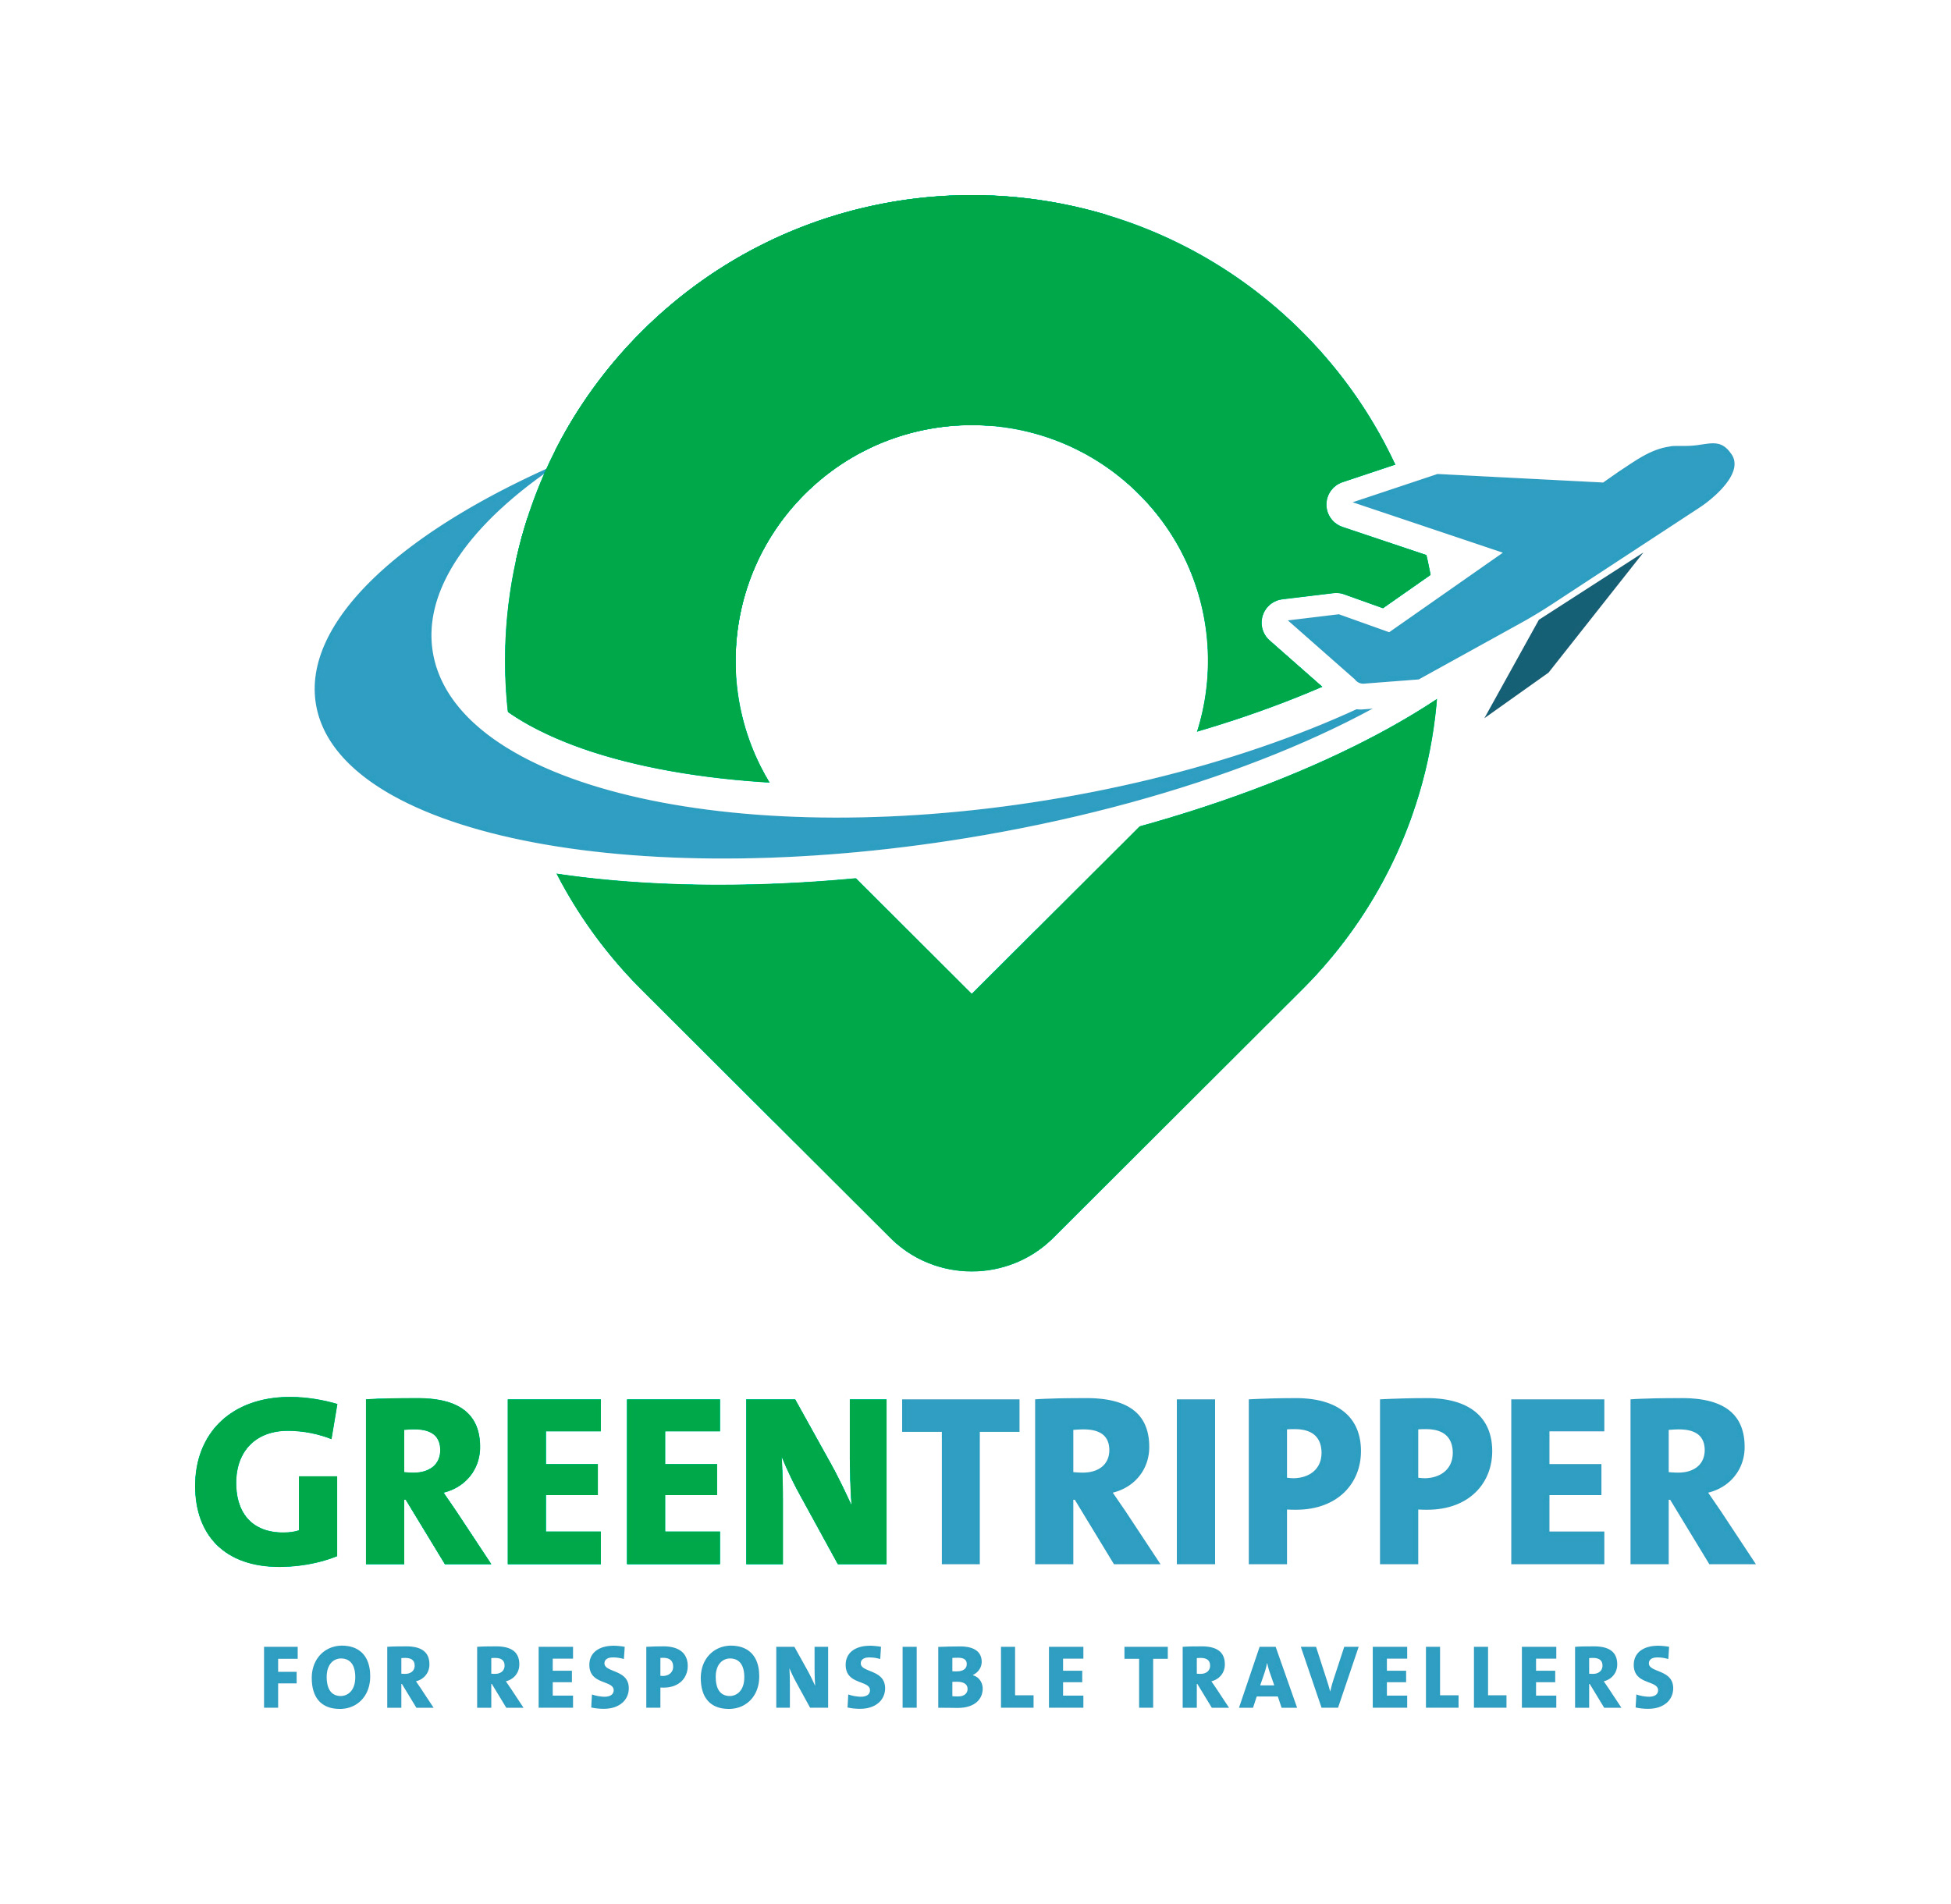 greentripper logo rand 2